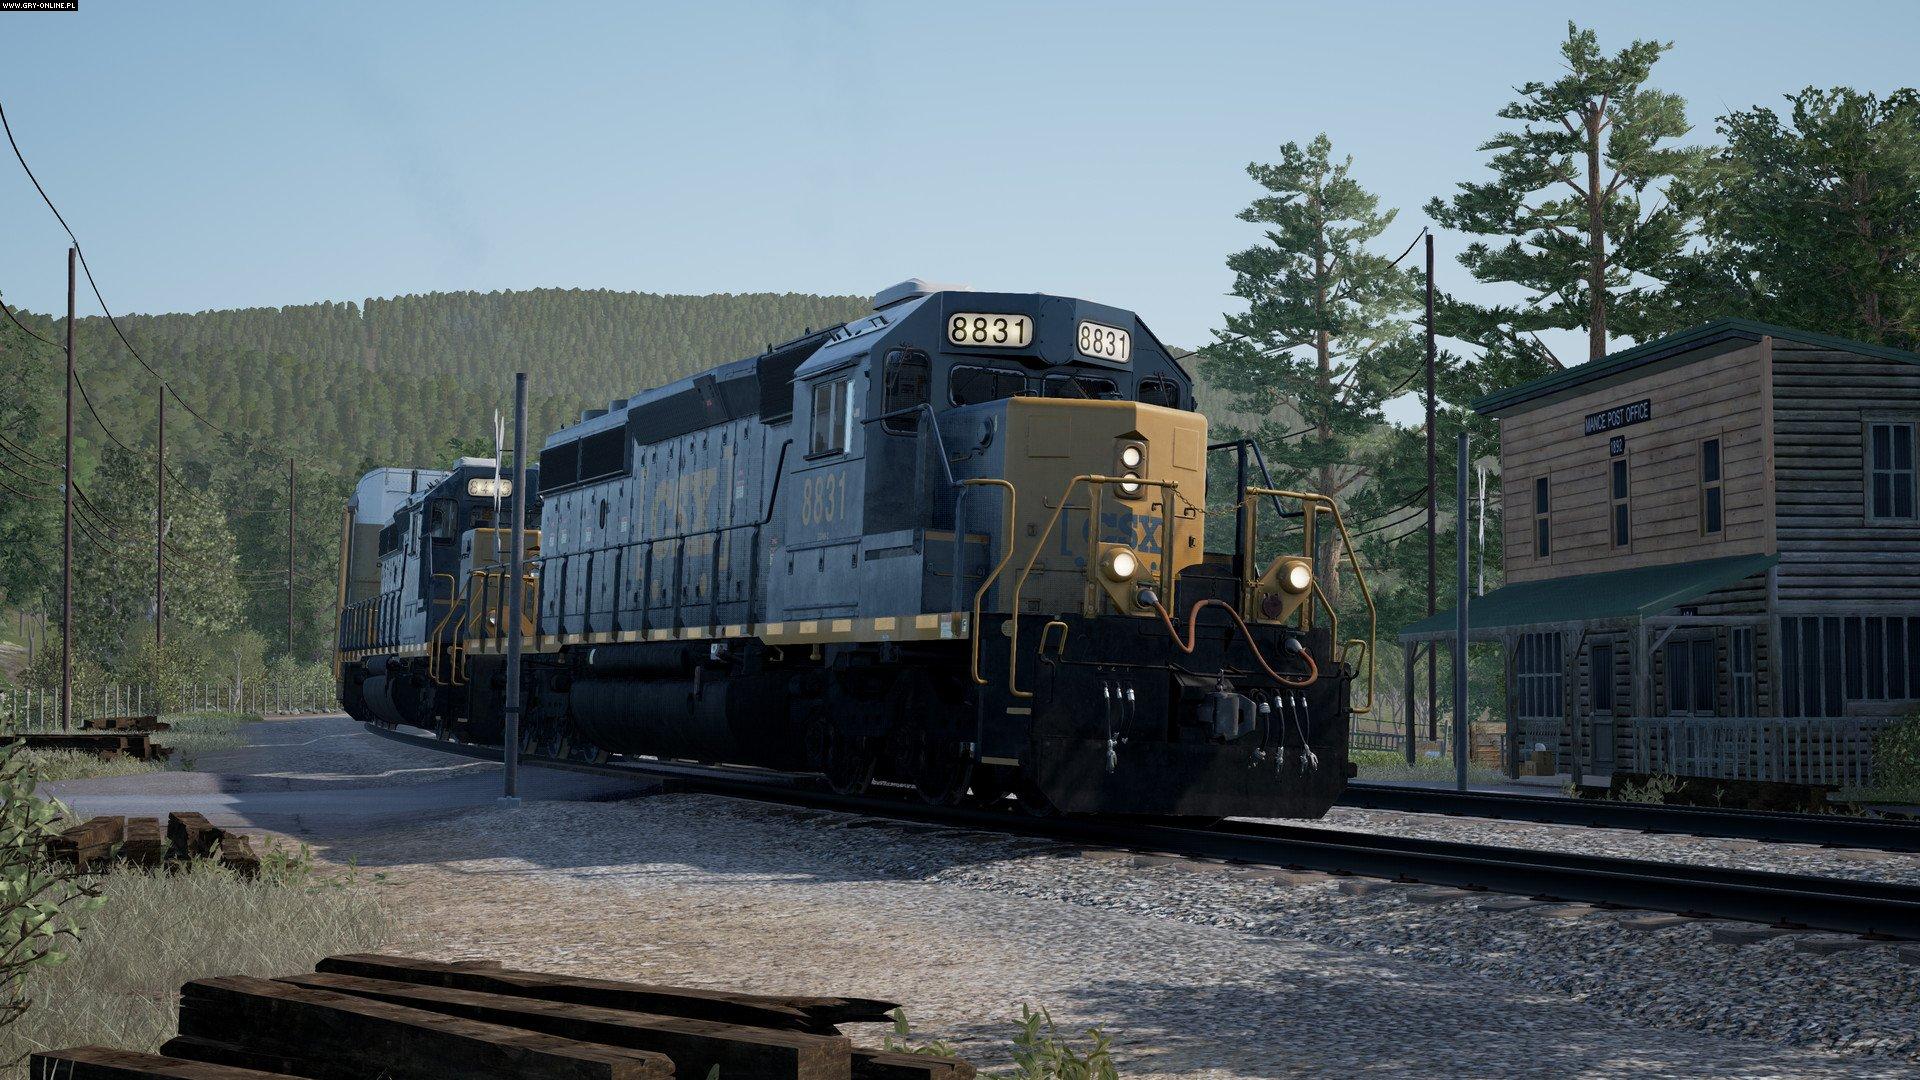 Train Sim World: CSX Heavy Haul PC, XONE Games Image 6/8, Dovetail Games/Rail Simulator Developments